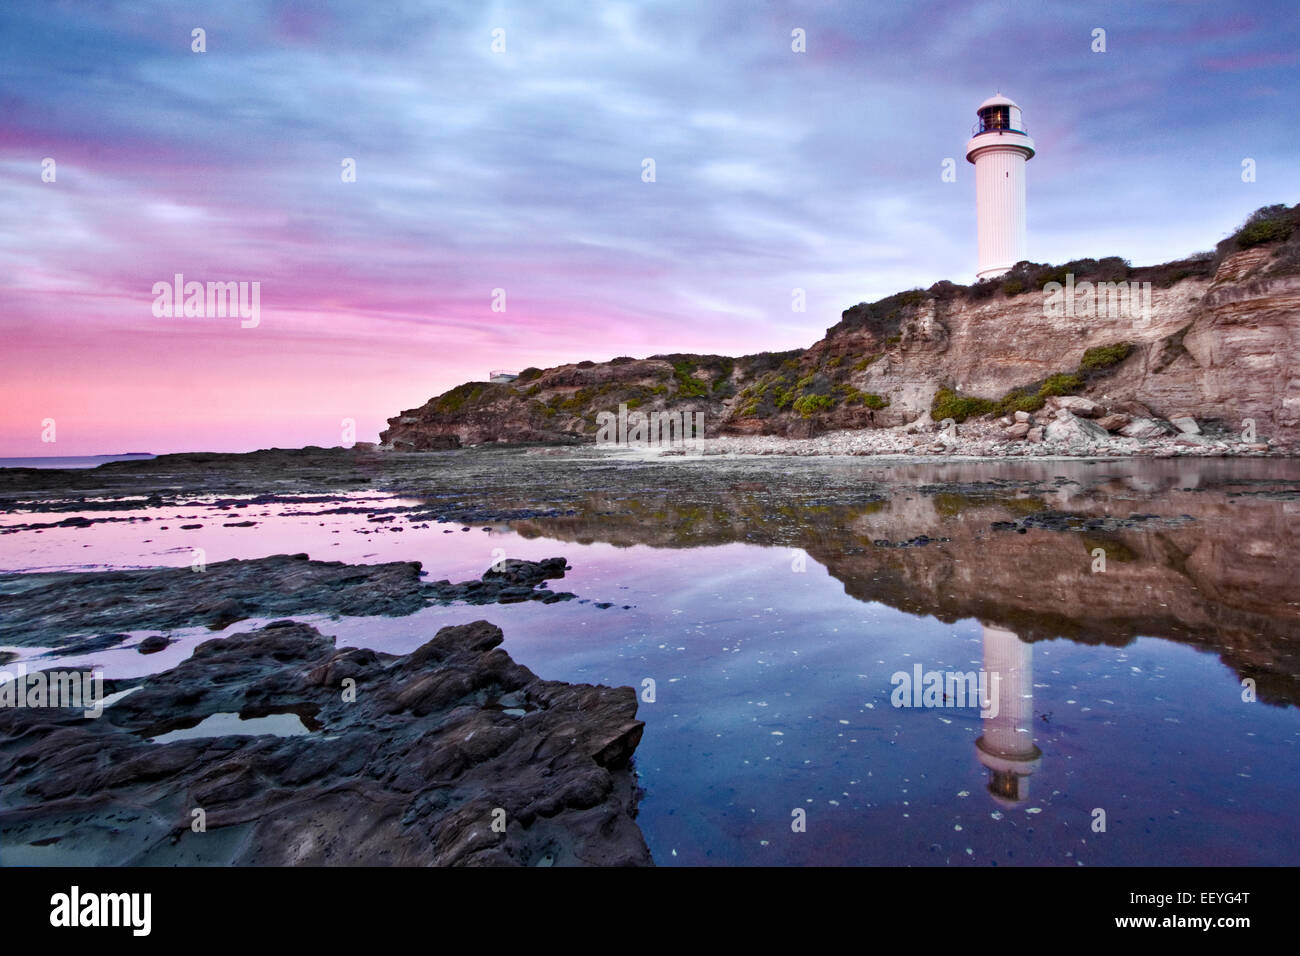 Australian coastal scene - Stock Image